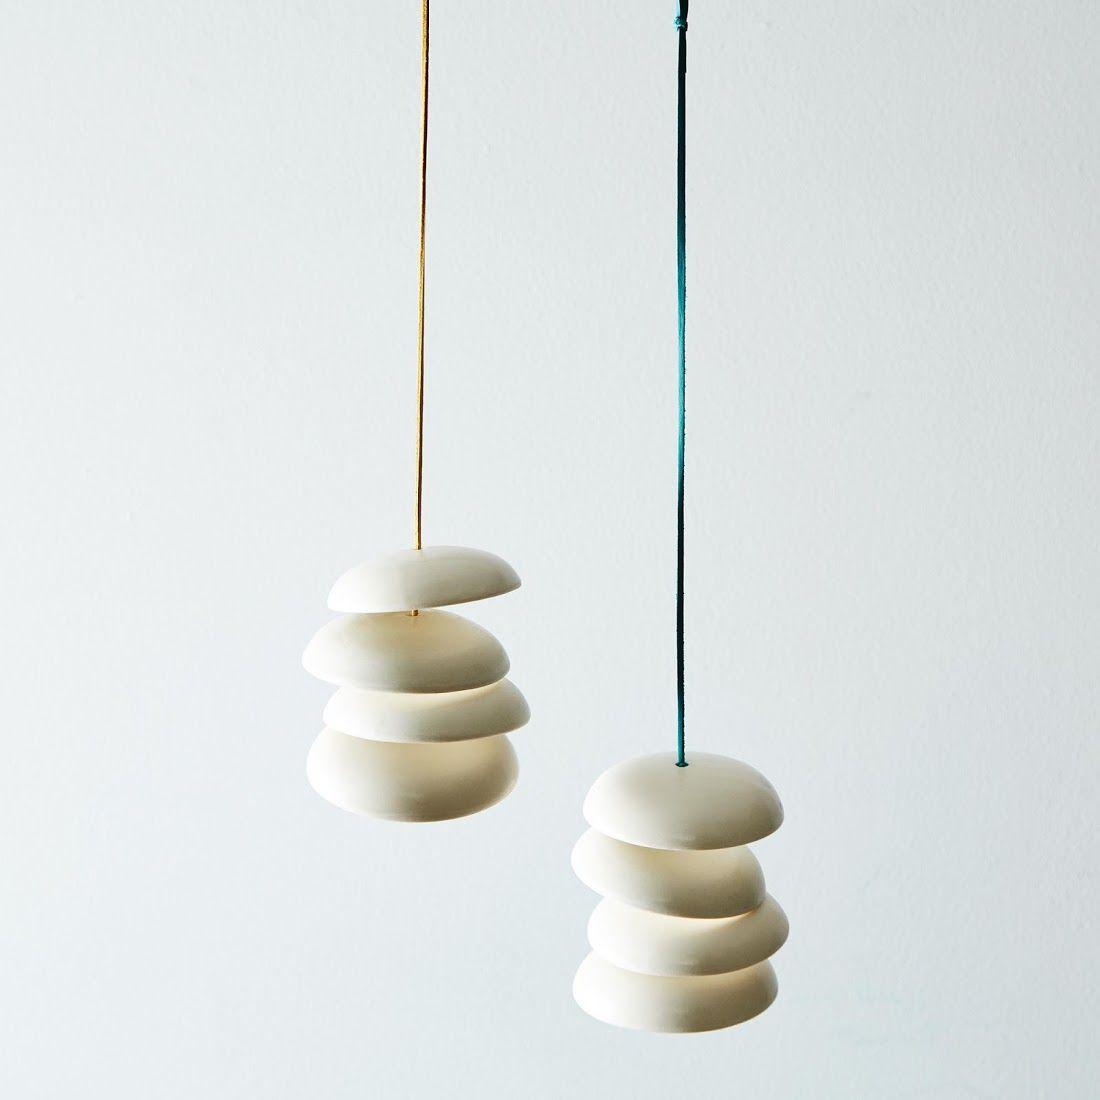 Porcelain Wind Chimes